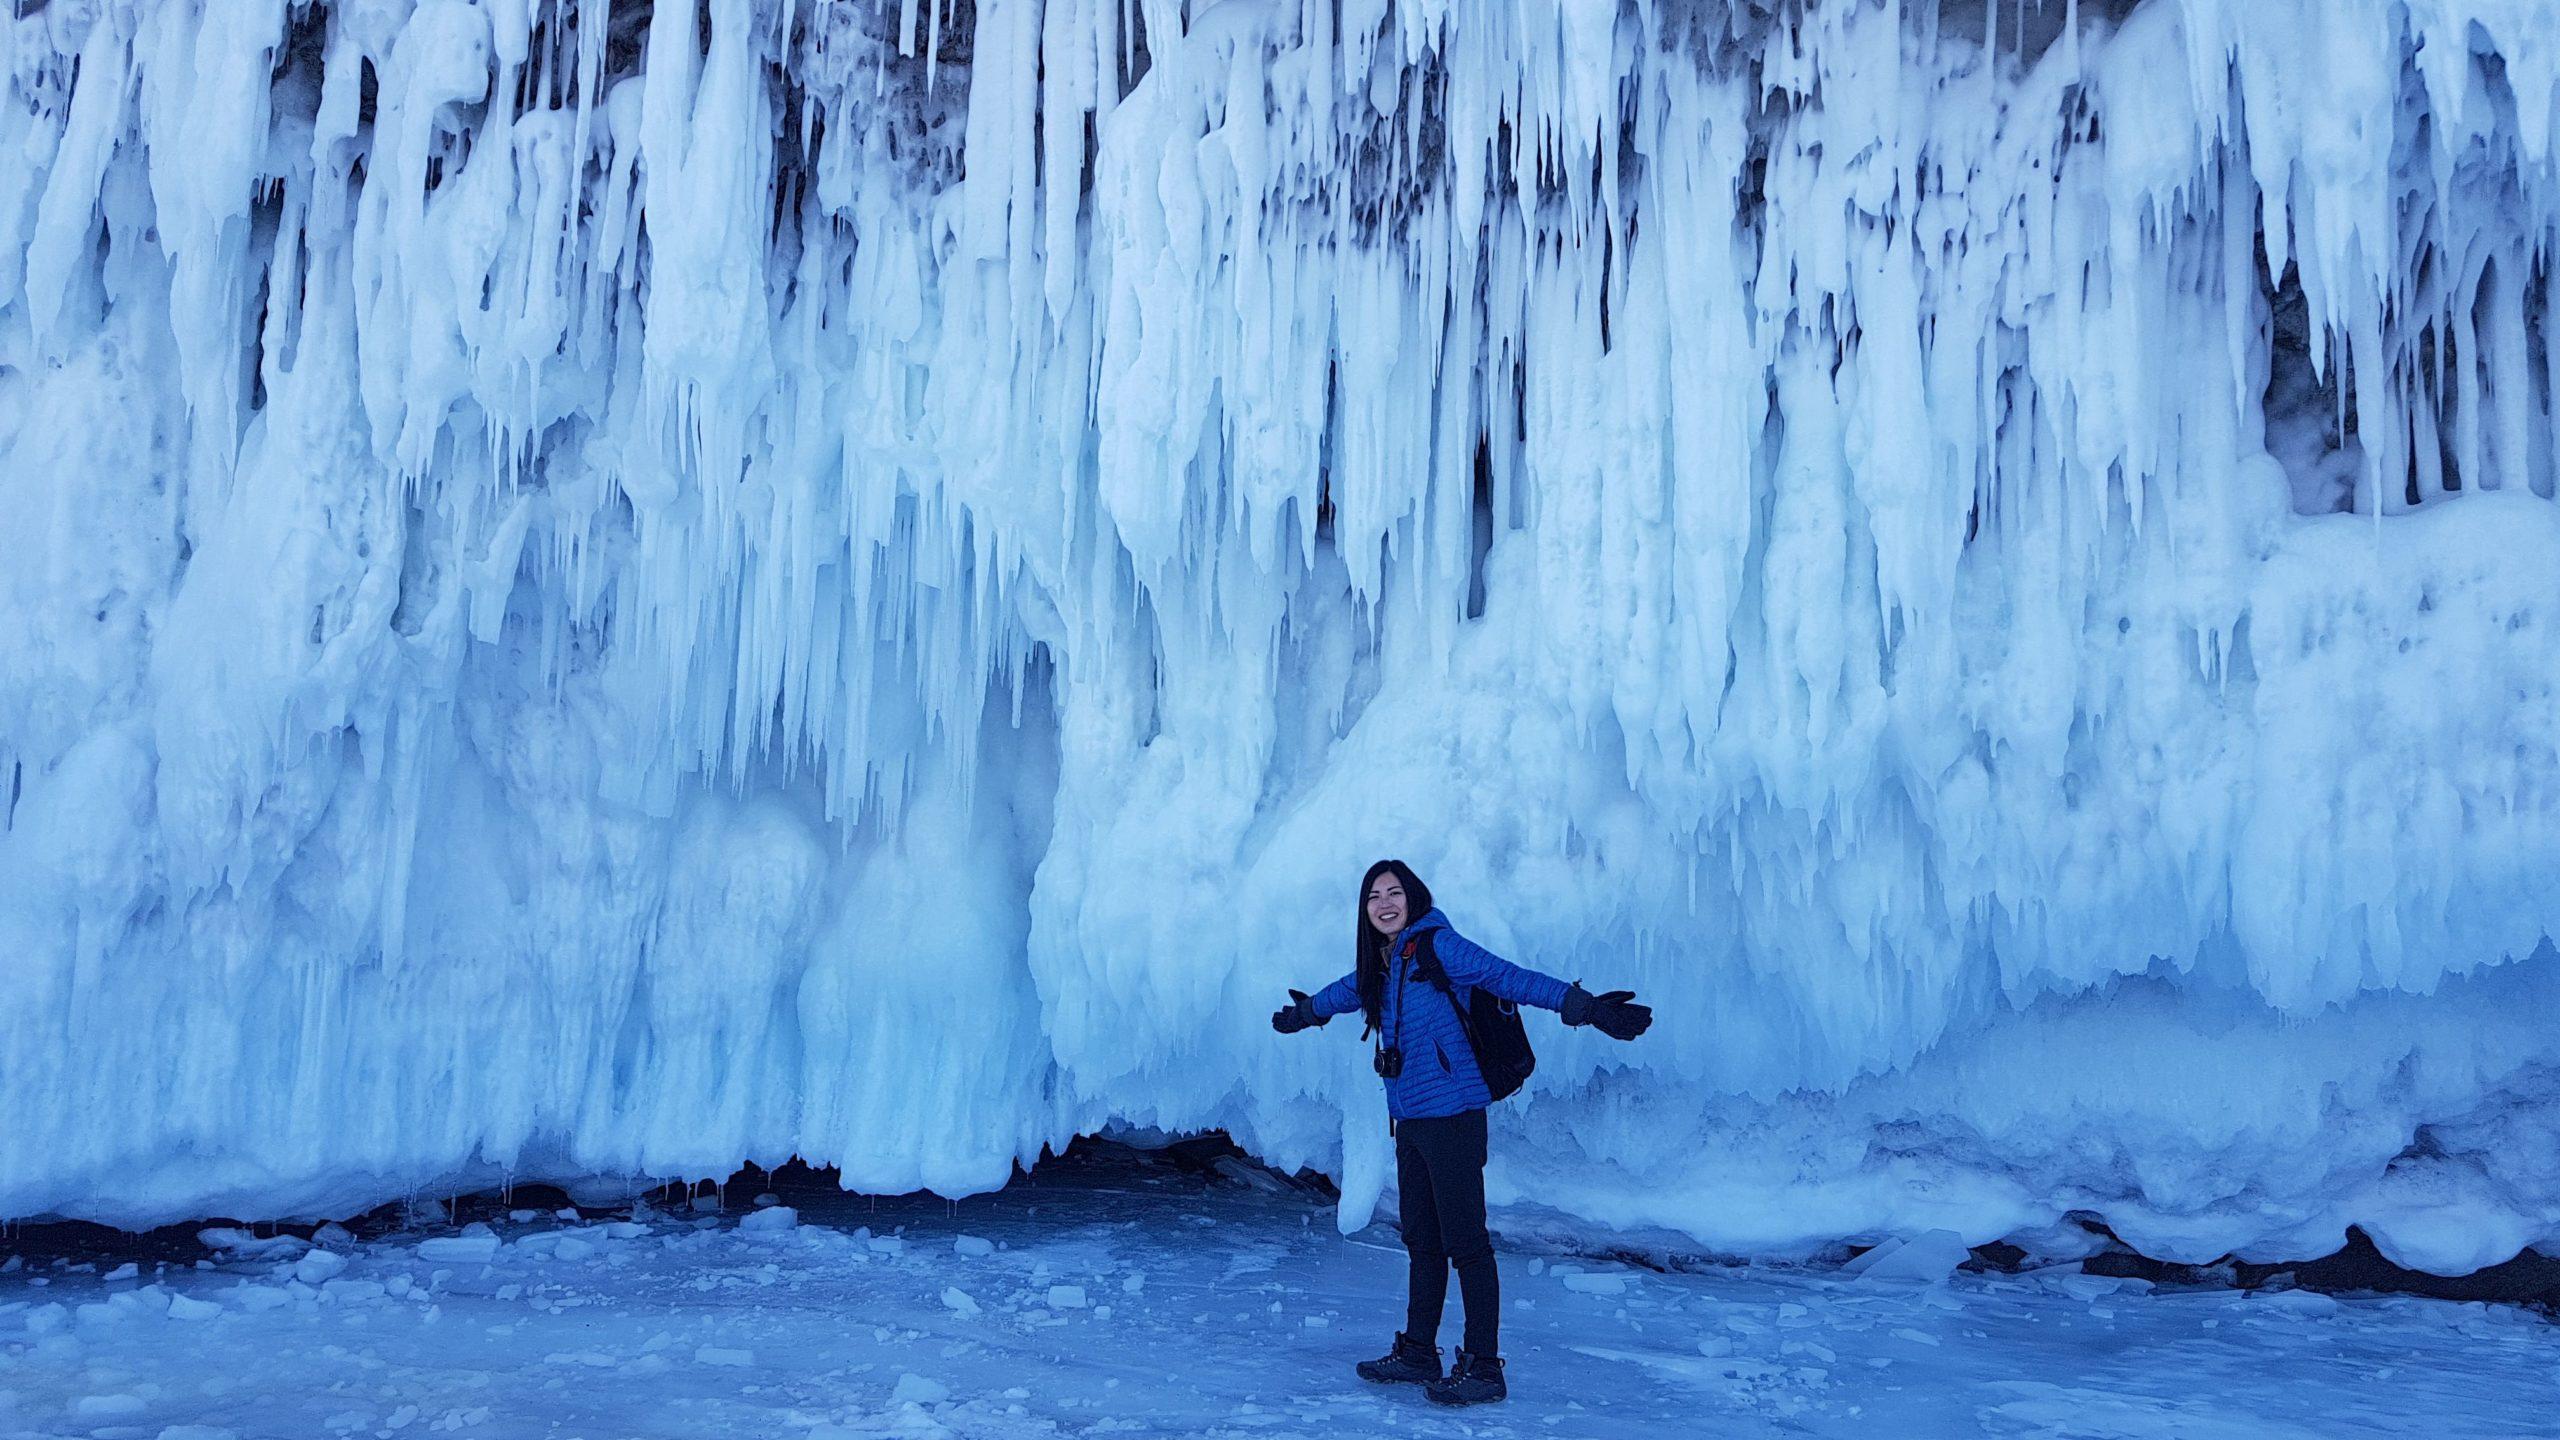 Winter in Baikal- 57 400 RUB